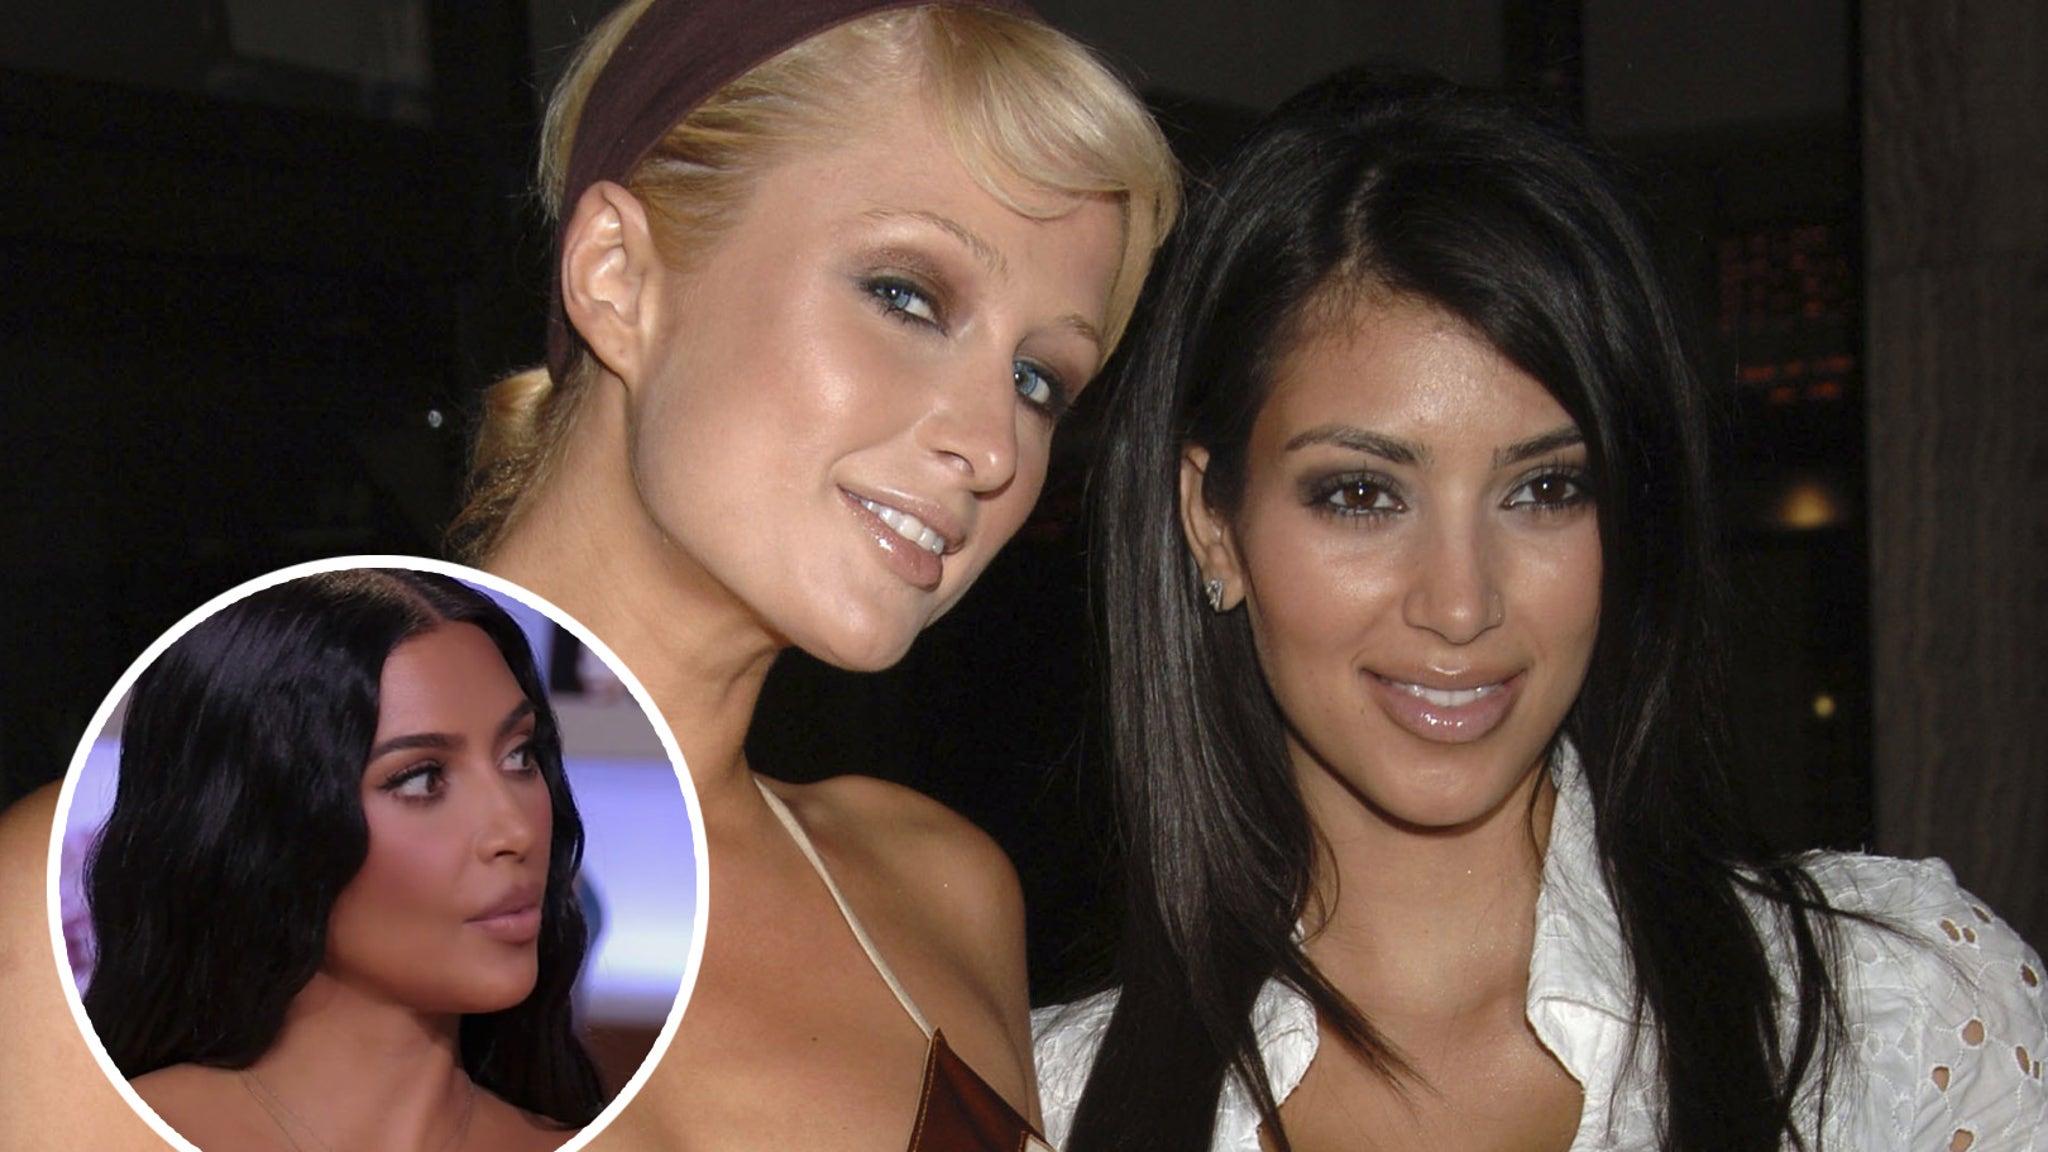 Kim Kardashian Remembers Paris Hilton Fight, Sex Tape Scandal, And Early Fame At KUWTK Reunion